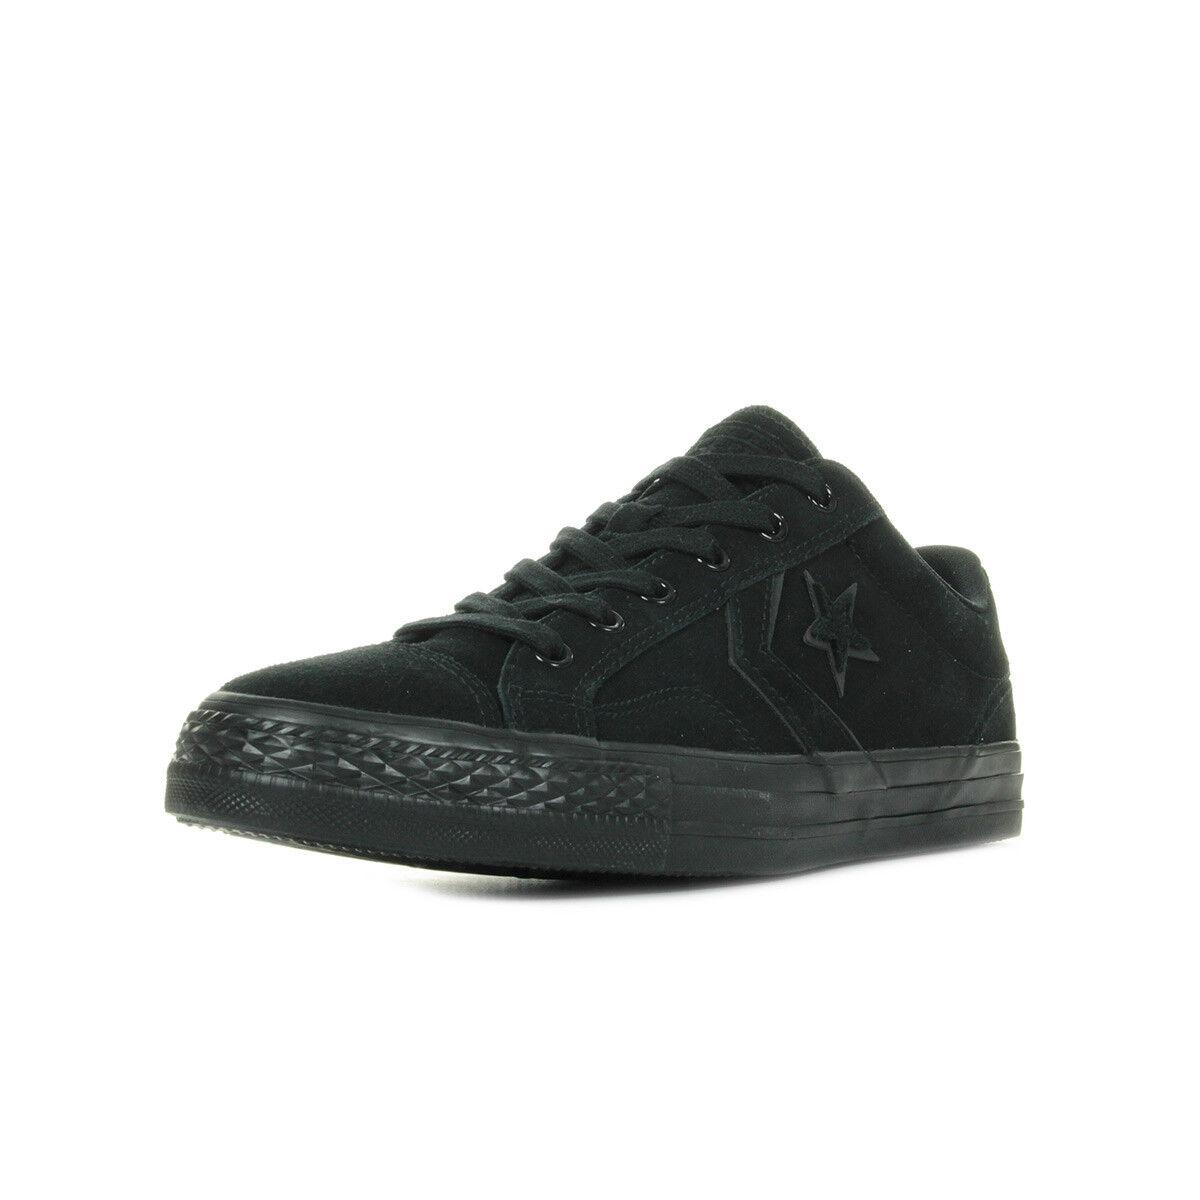 Zapatos Baskets Converse Hombre Star Player Cuir OX taille Noir Noire Cuir Player Lacets d9f3f1